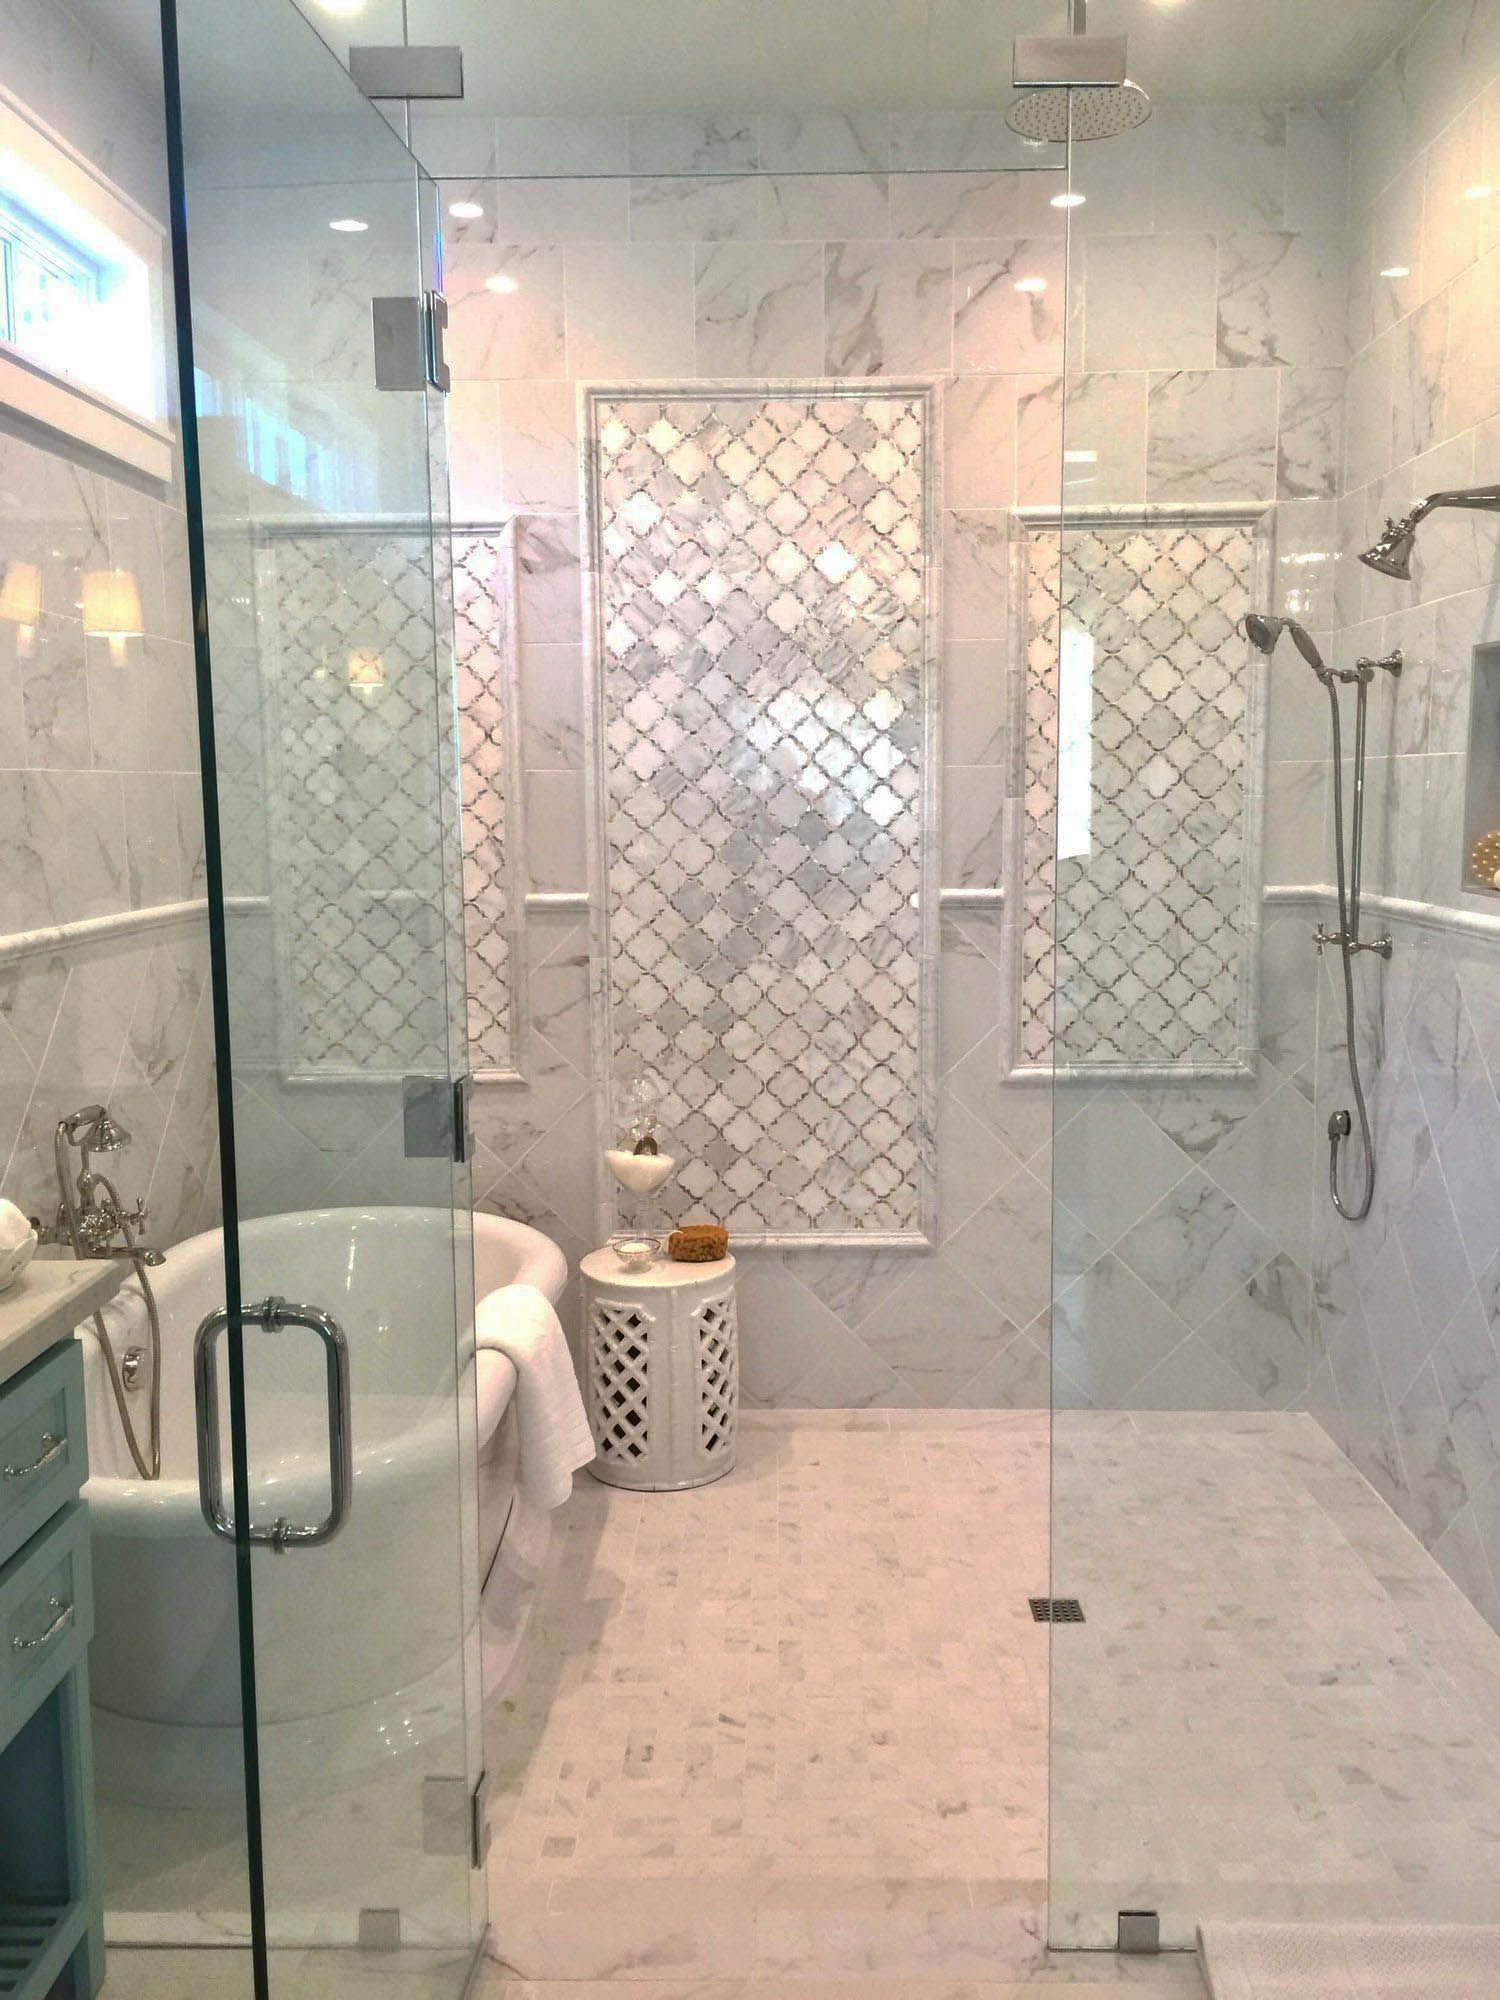 30 Contemporary Shower Ideas For Your Bathroom Bathroom Interior Bathroom Tile Designs Luxury Bathroom Shower